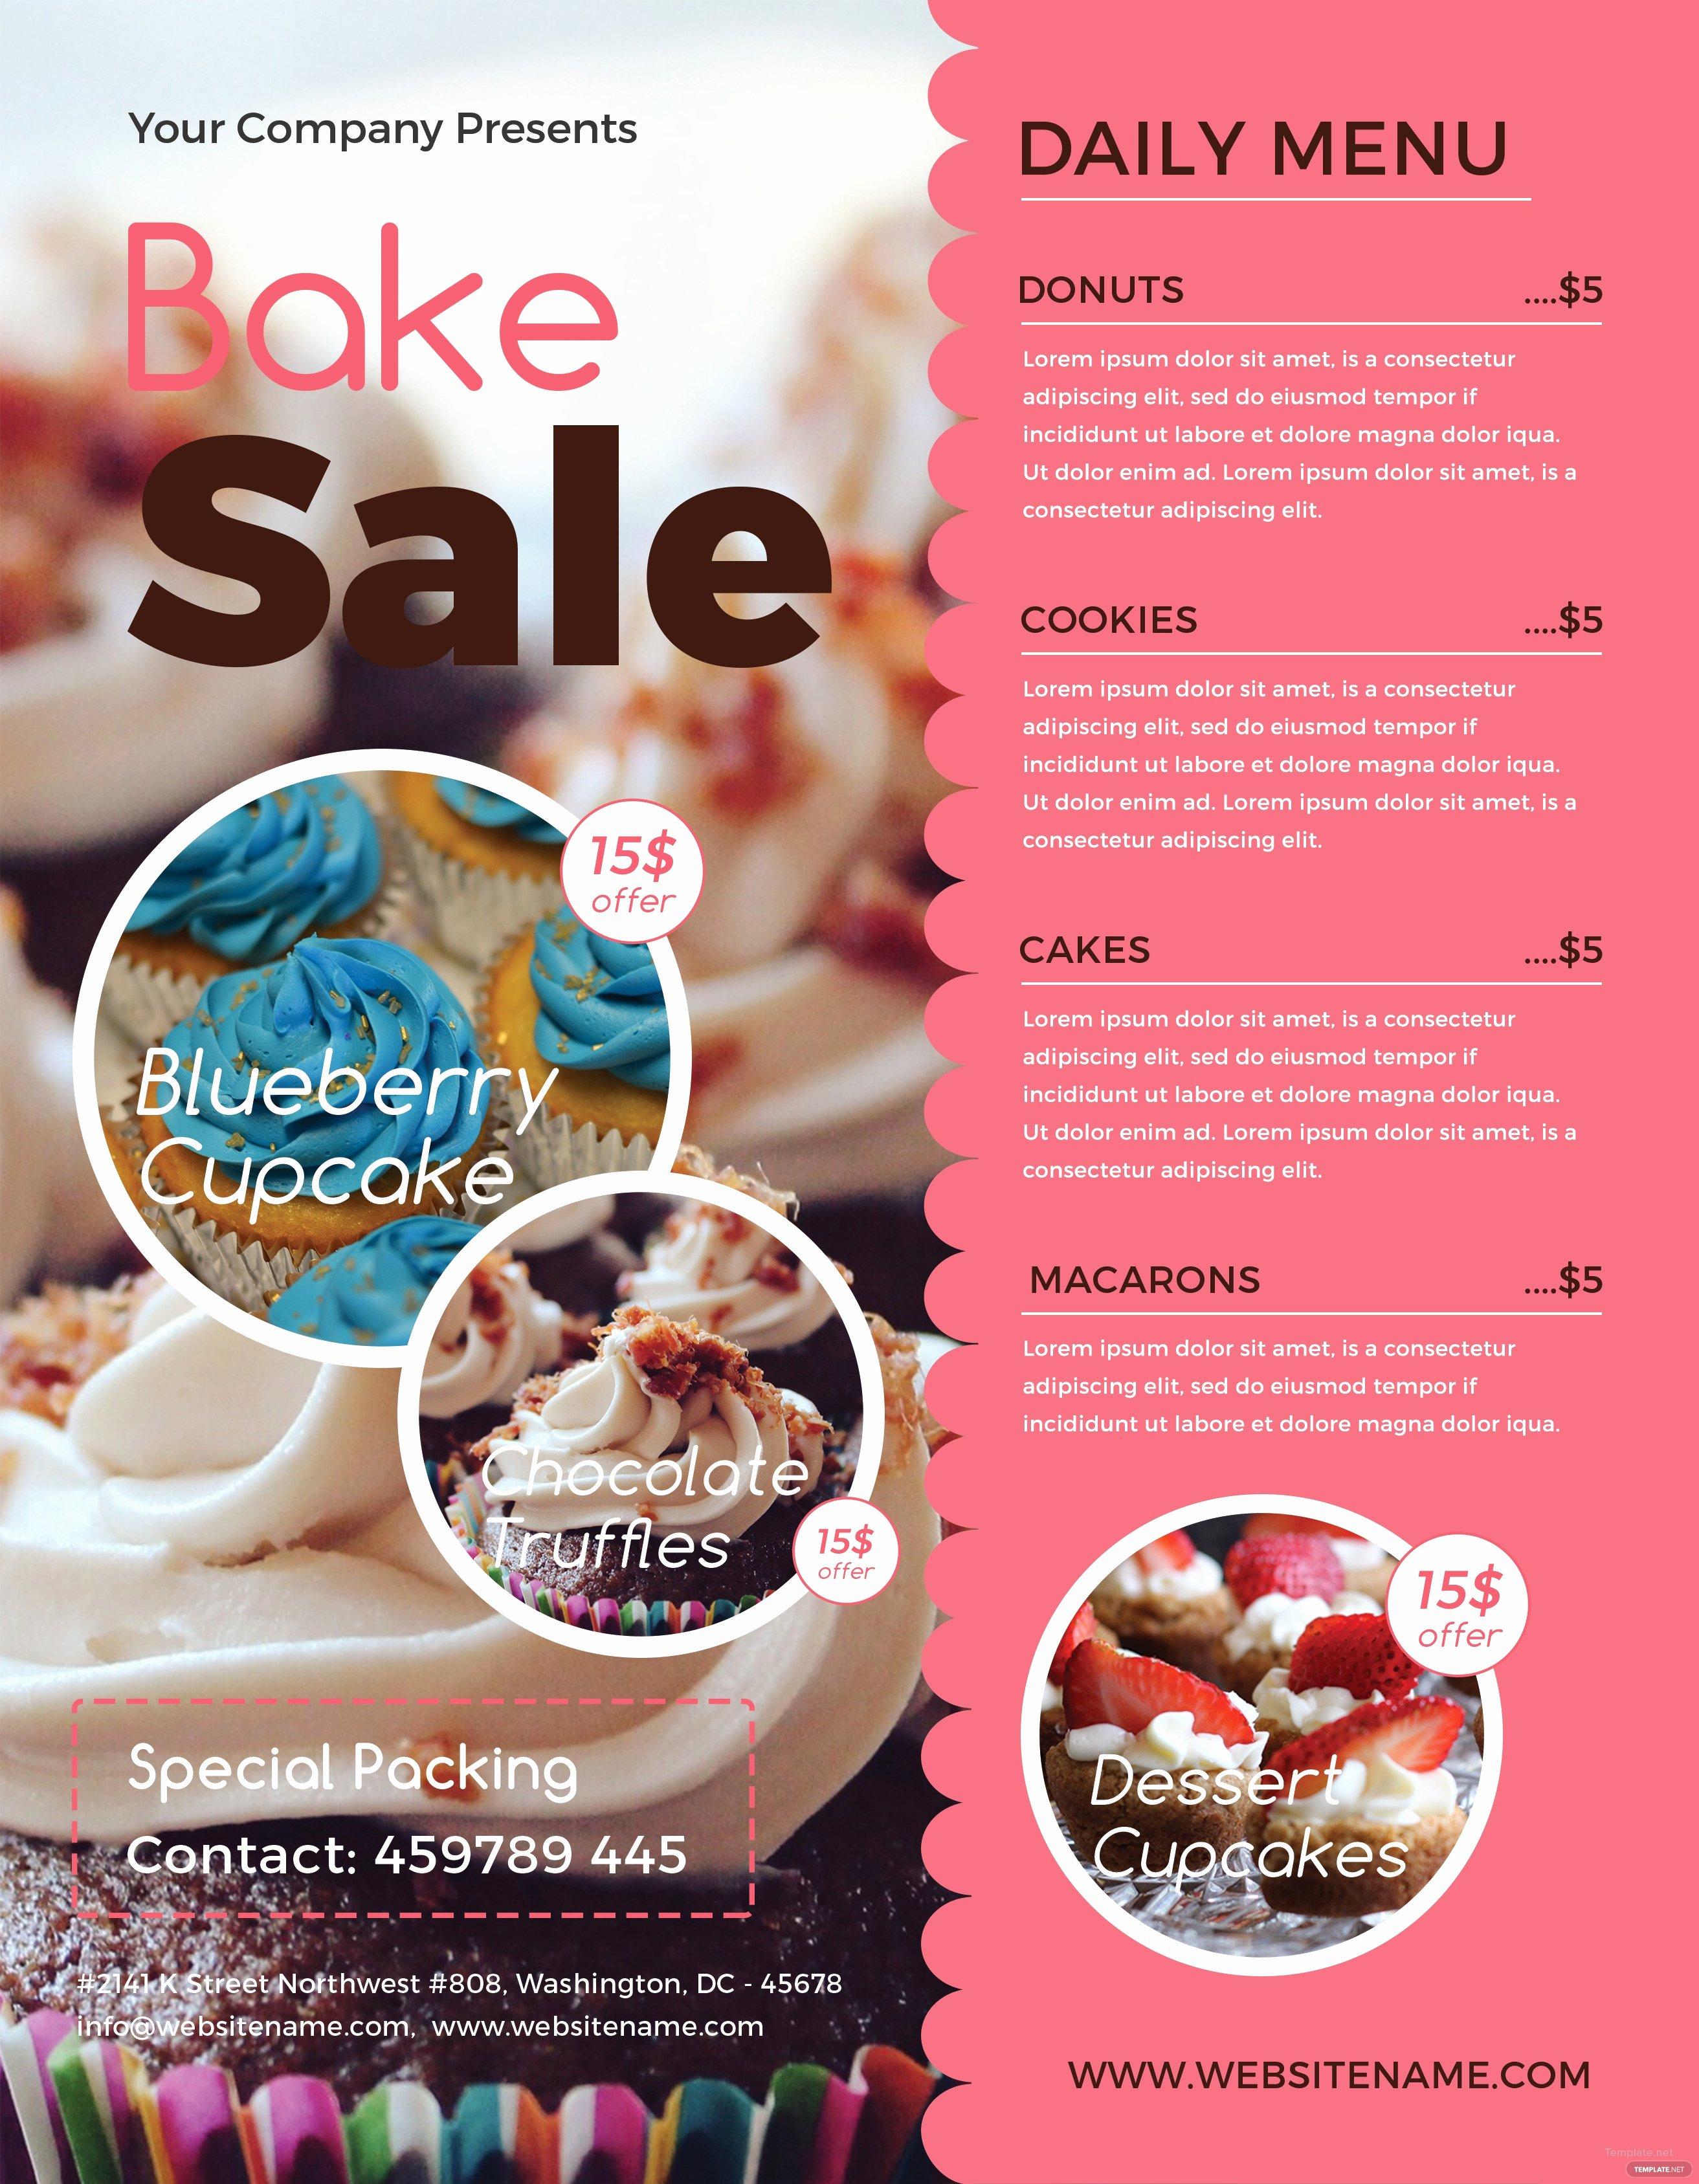 Bake Sale Flyer Template Word Beautiful Free Bake Sale Flyer Template In Adobe Shop Illustrator Microsoft Word Publisher Apple